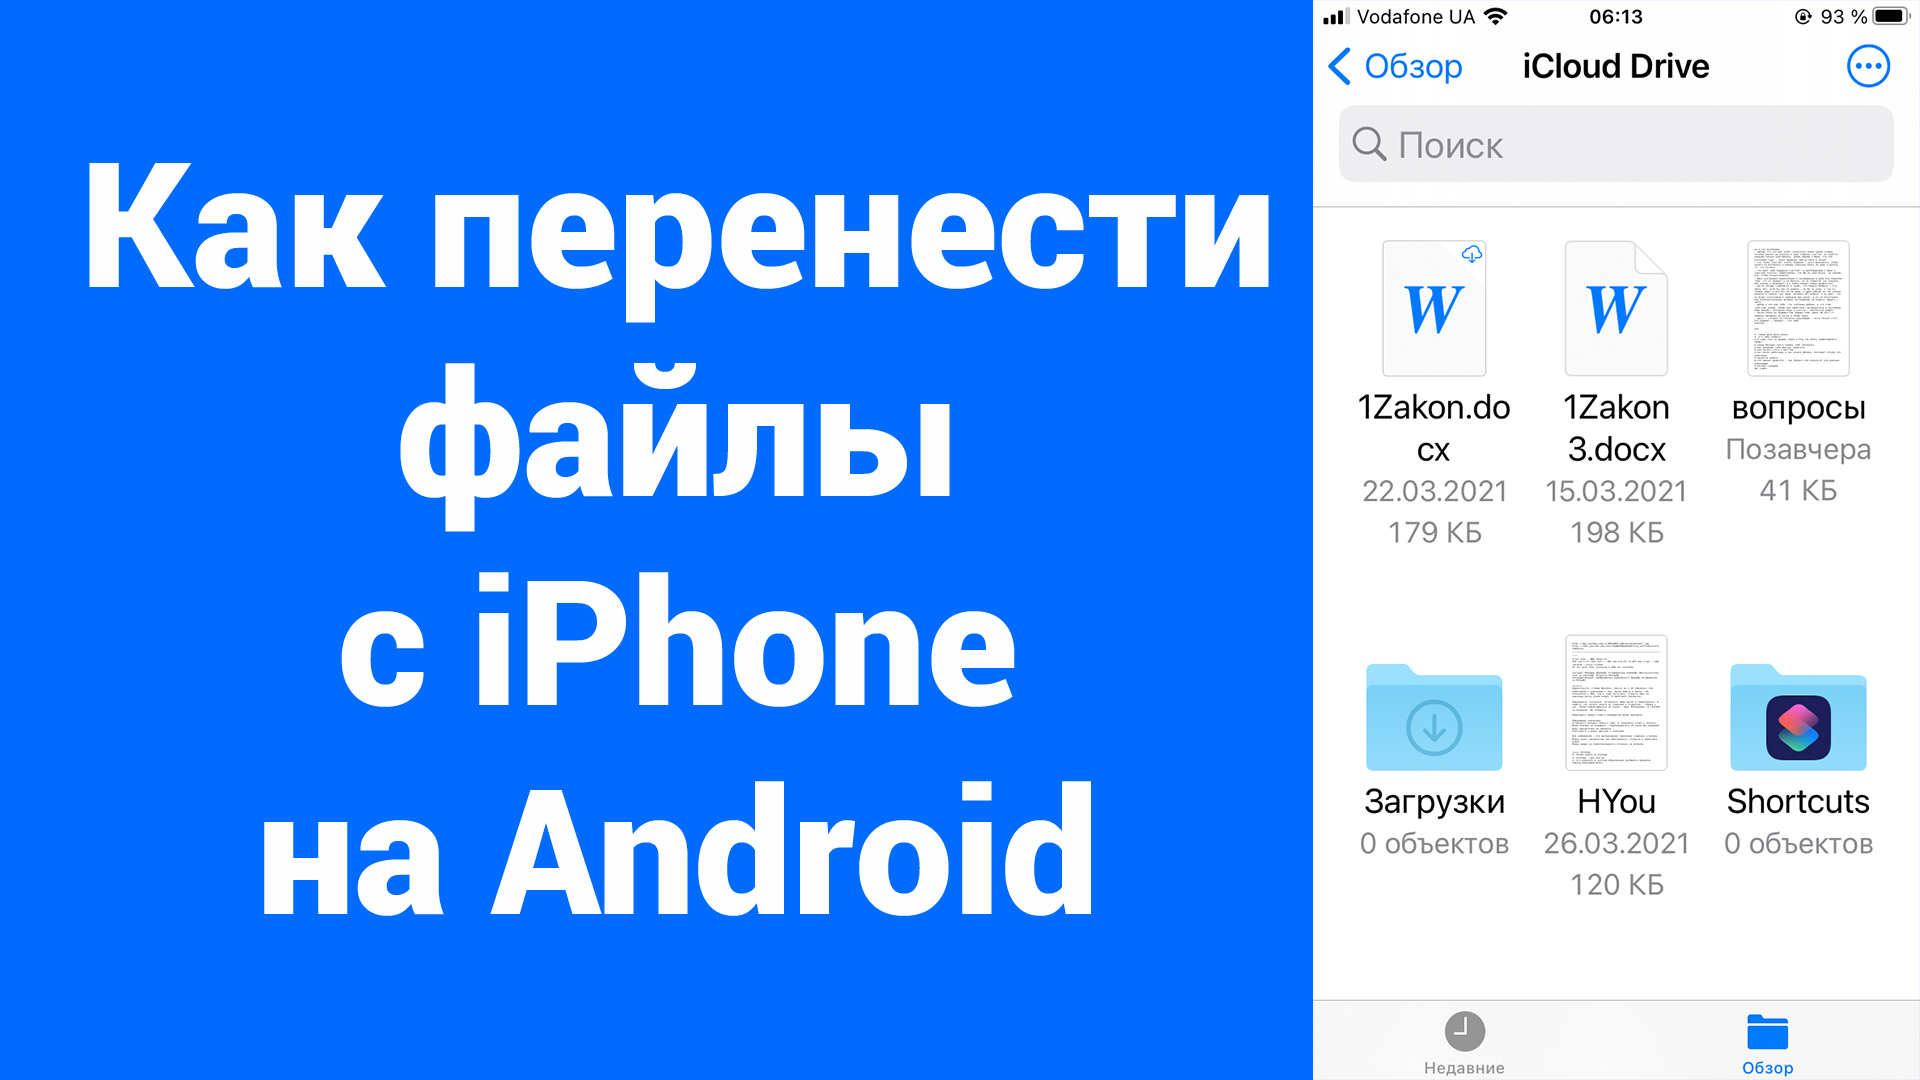 Как перенести файлы и документы с iPhone на Android (Samsung, Huawei, Nokia, OPPO, OnePlus, Samsung, Xiaomi и другие)